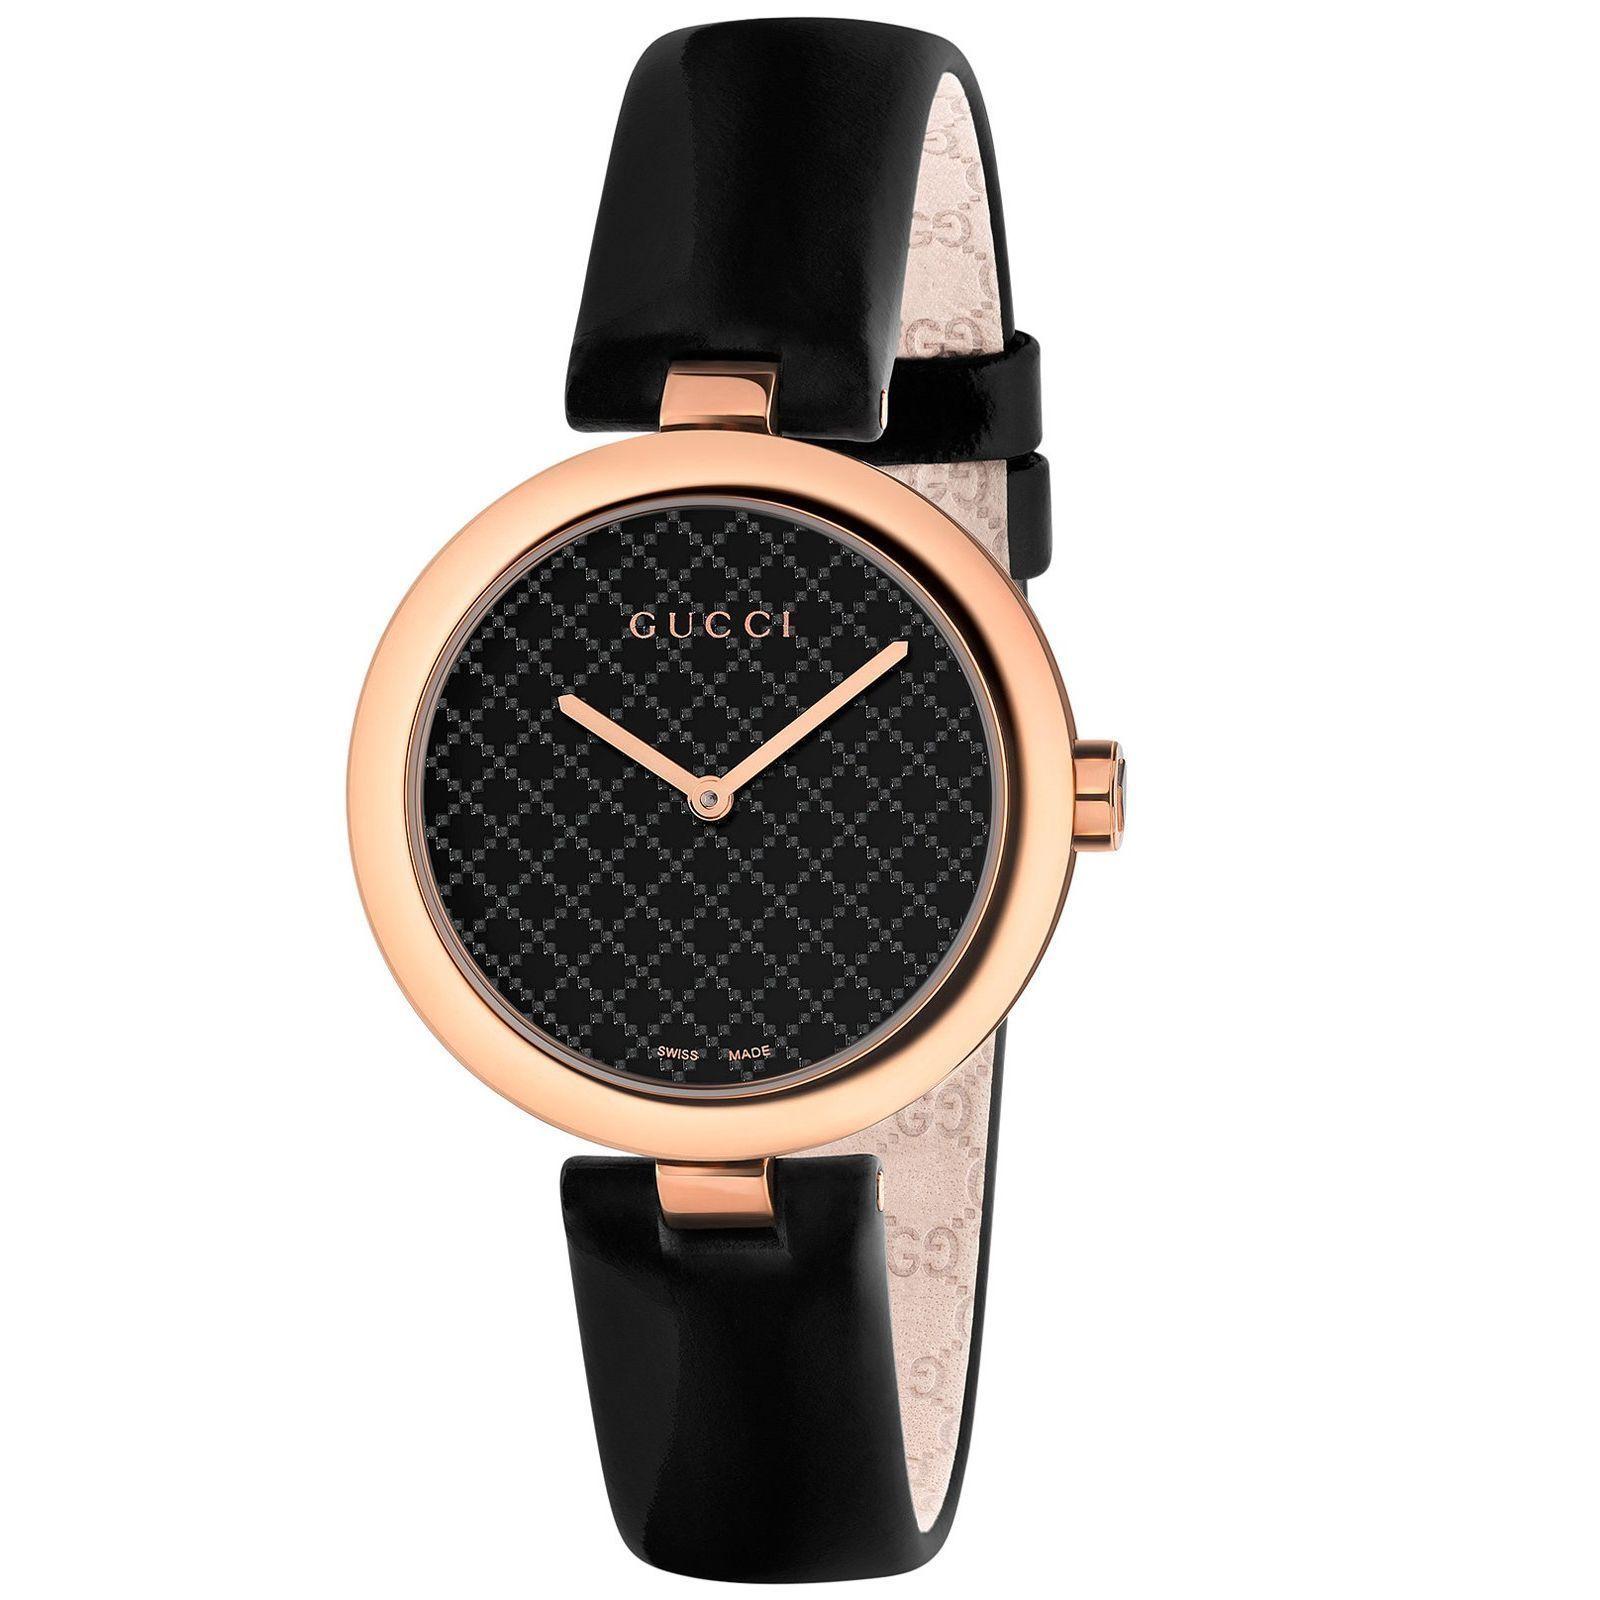 7c04fea5499 Gucci Women s YA141401  Diamatissima  Watch